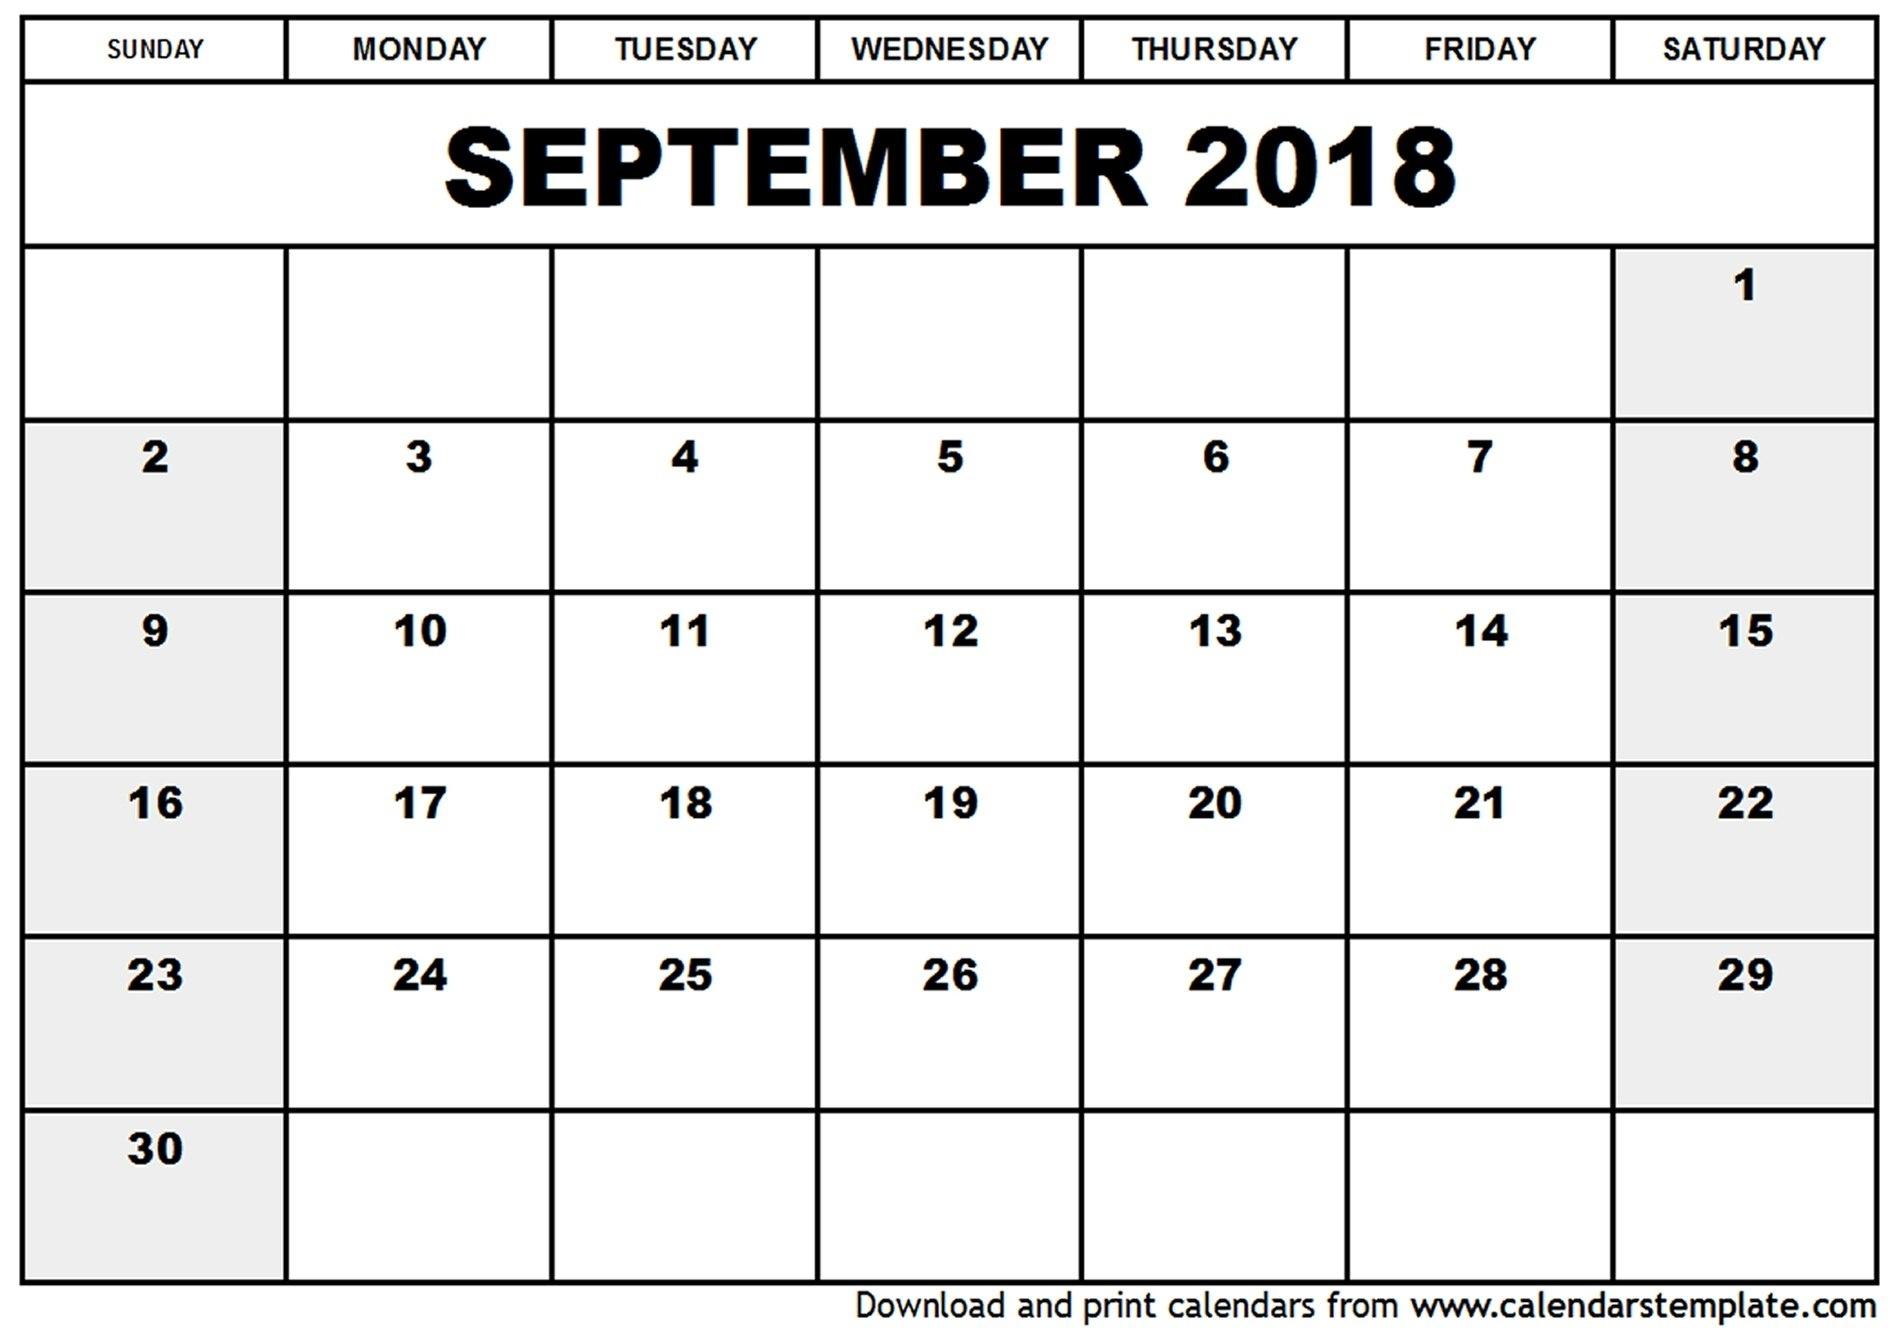 Monthly Planner Template September 2018 | Listmachinepro  Calendar For Month Of September